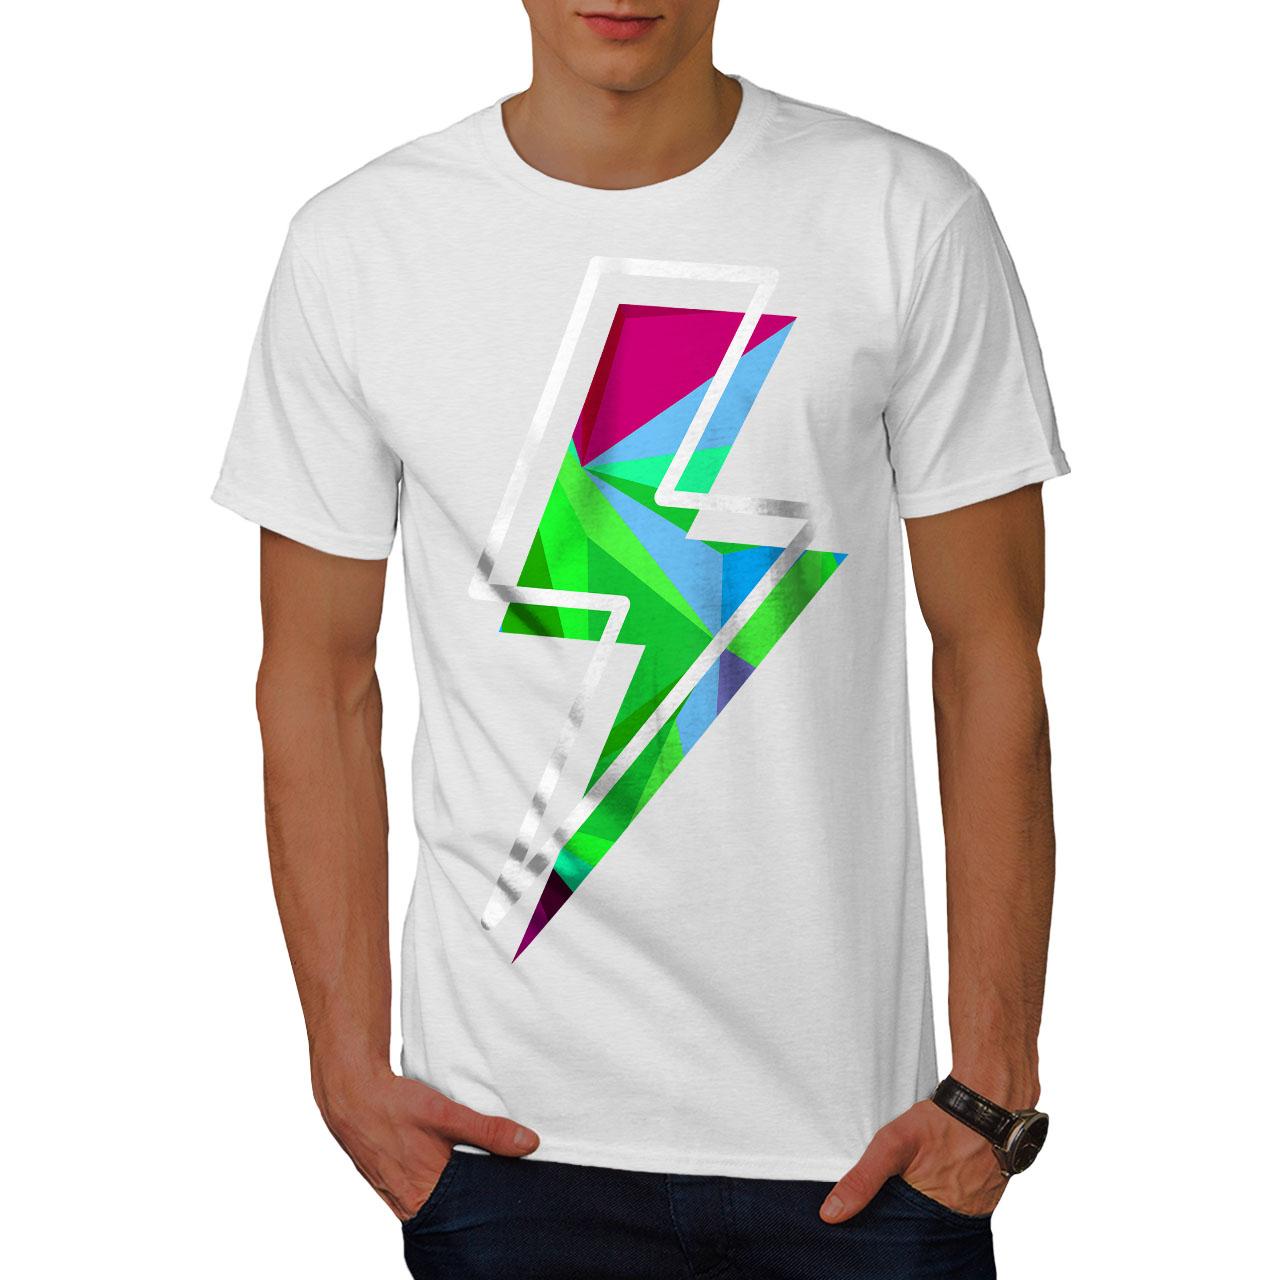 Wellcoda Flash Stylish Art Mens T-shirt, Powerful Graphic De